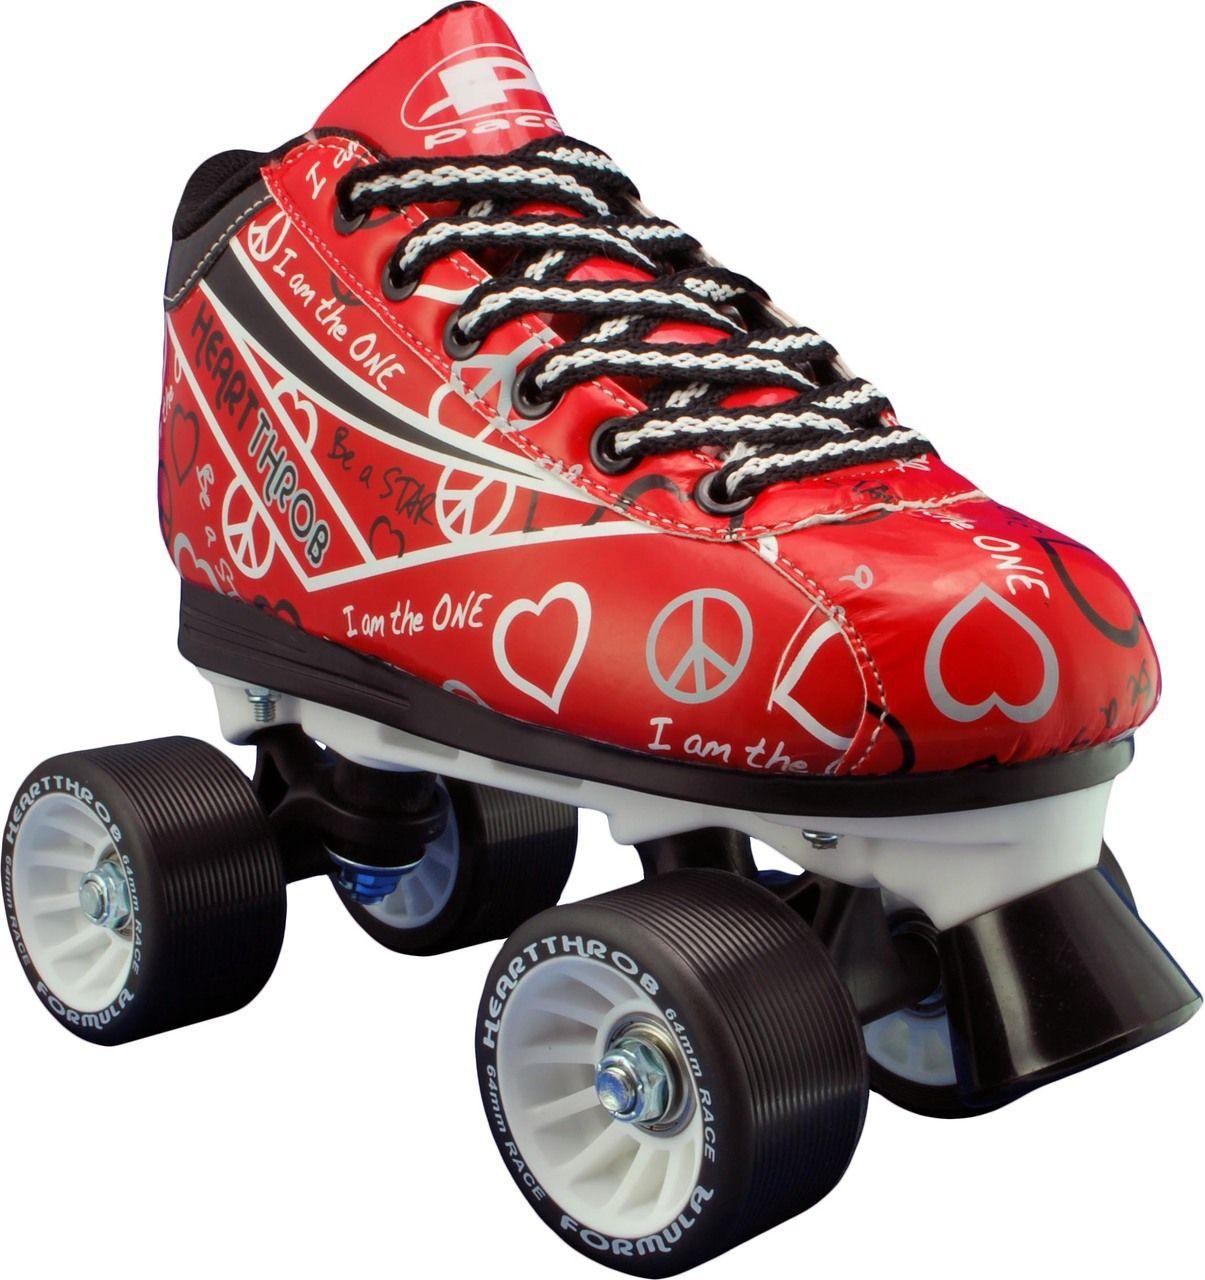 Quad roller skates amazon - Pacer Heart Throb Roller Skate Bad Girlfriend Skates Canadian Roller Derby Skate Superstore